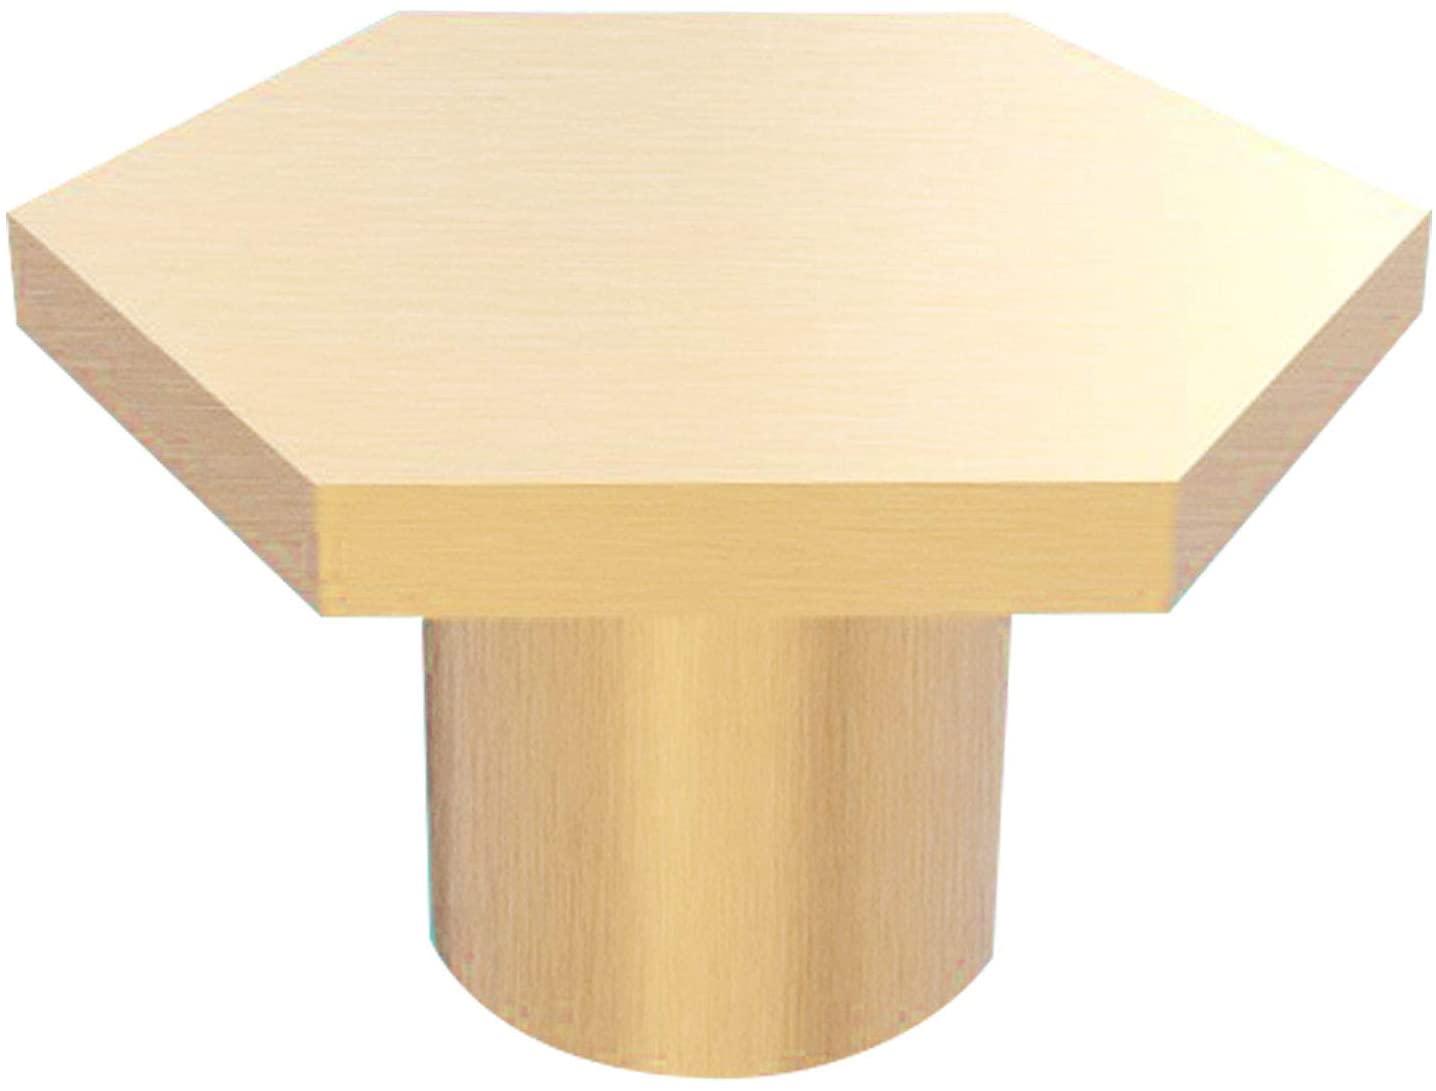 Trust4care 5-Pack Brushed Brass Hexagon Knobs Pull for Bedroom Cabinet, 100% Solid Brass Big Size Gold Dresser Drawer Pulls for Kitchen Furniture Decorative